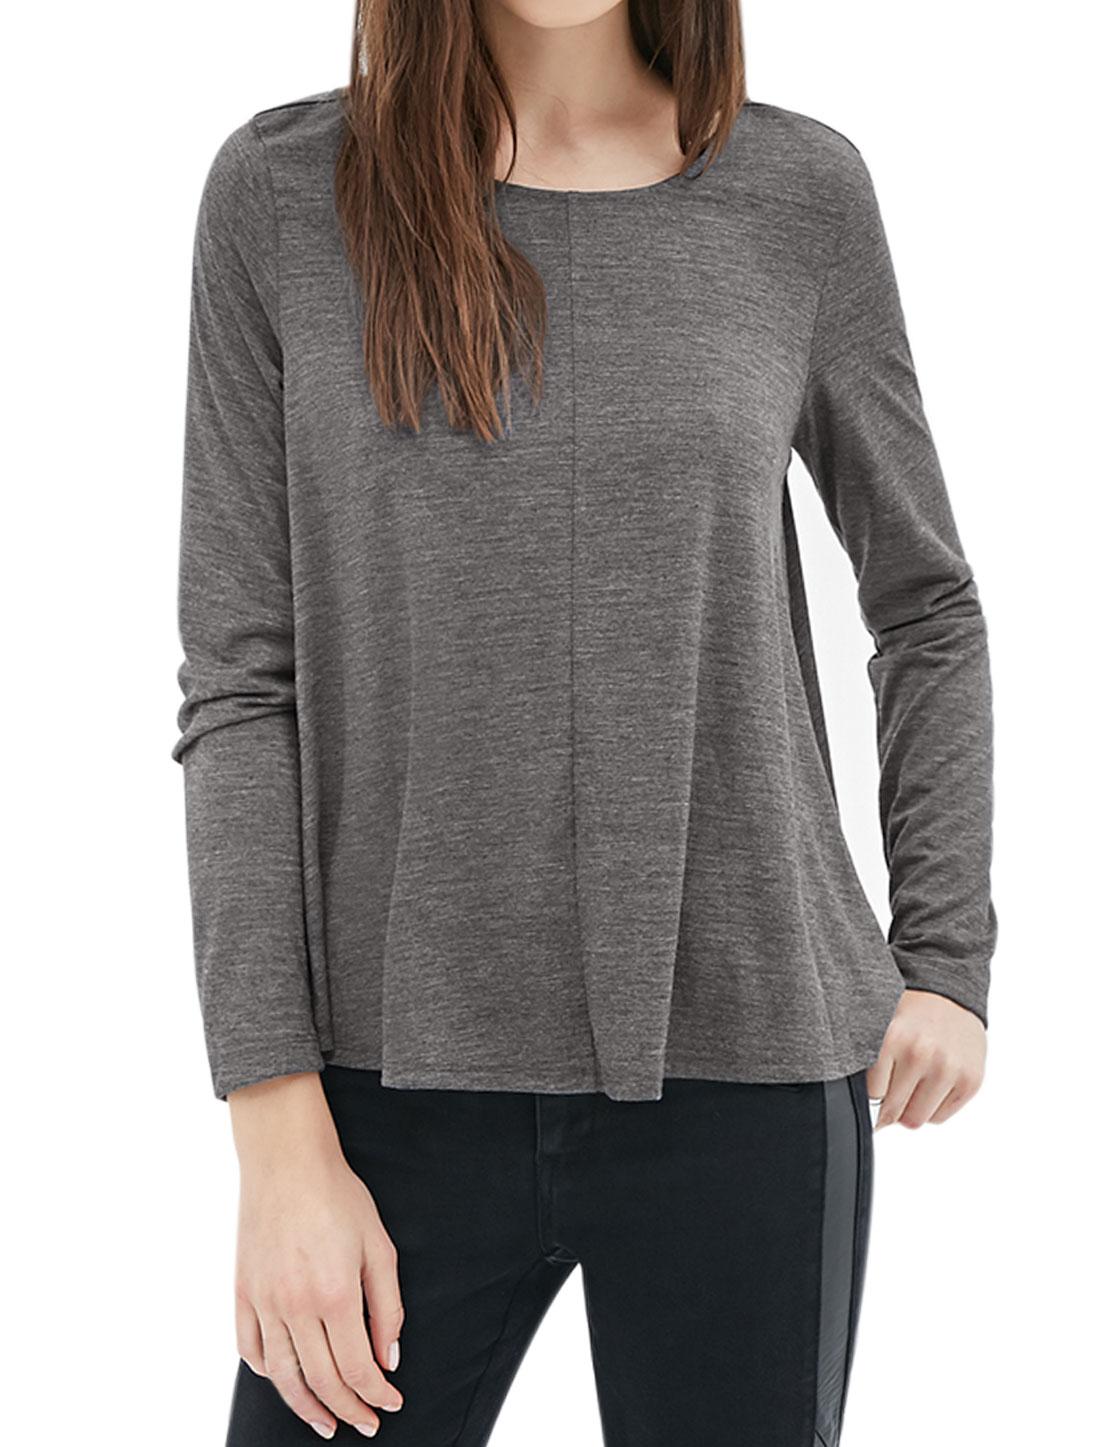 Women Round Neck Long Sleeves Loose Tee Shirt Gray XS